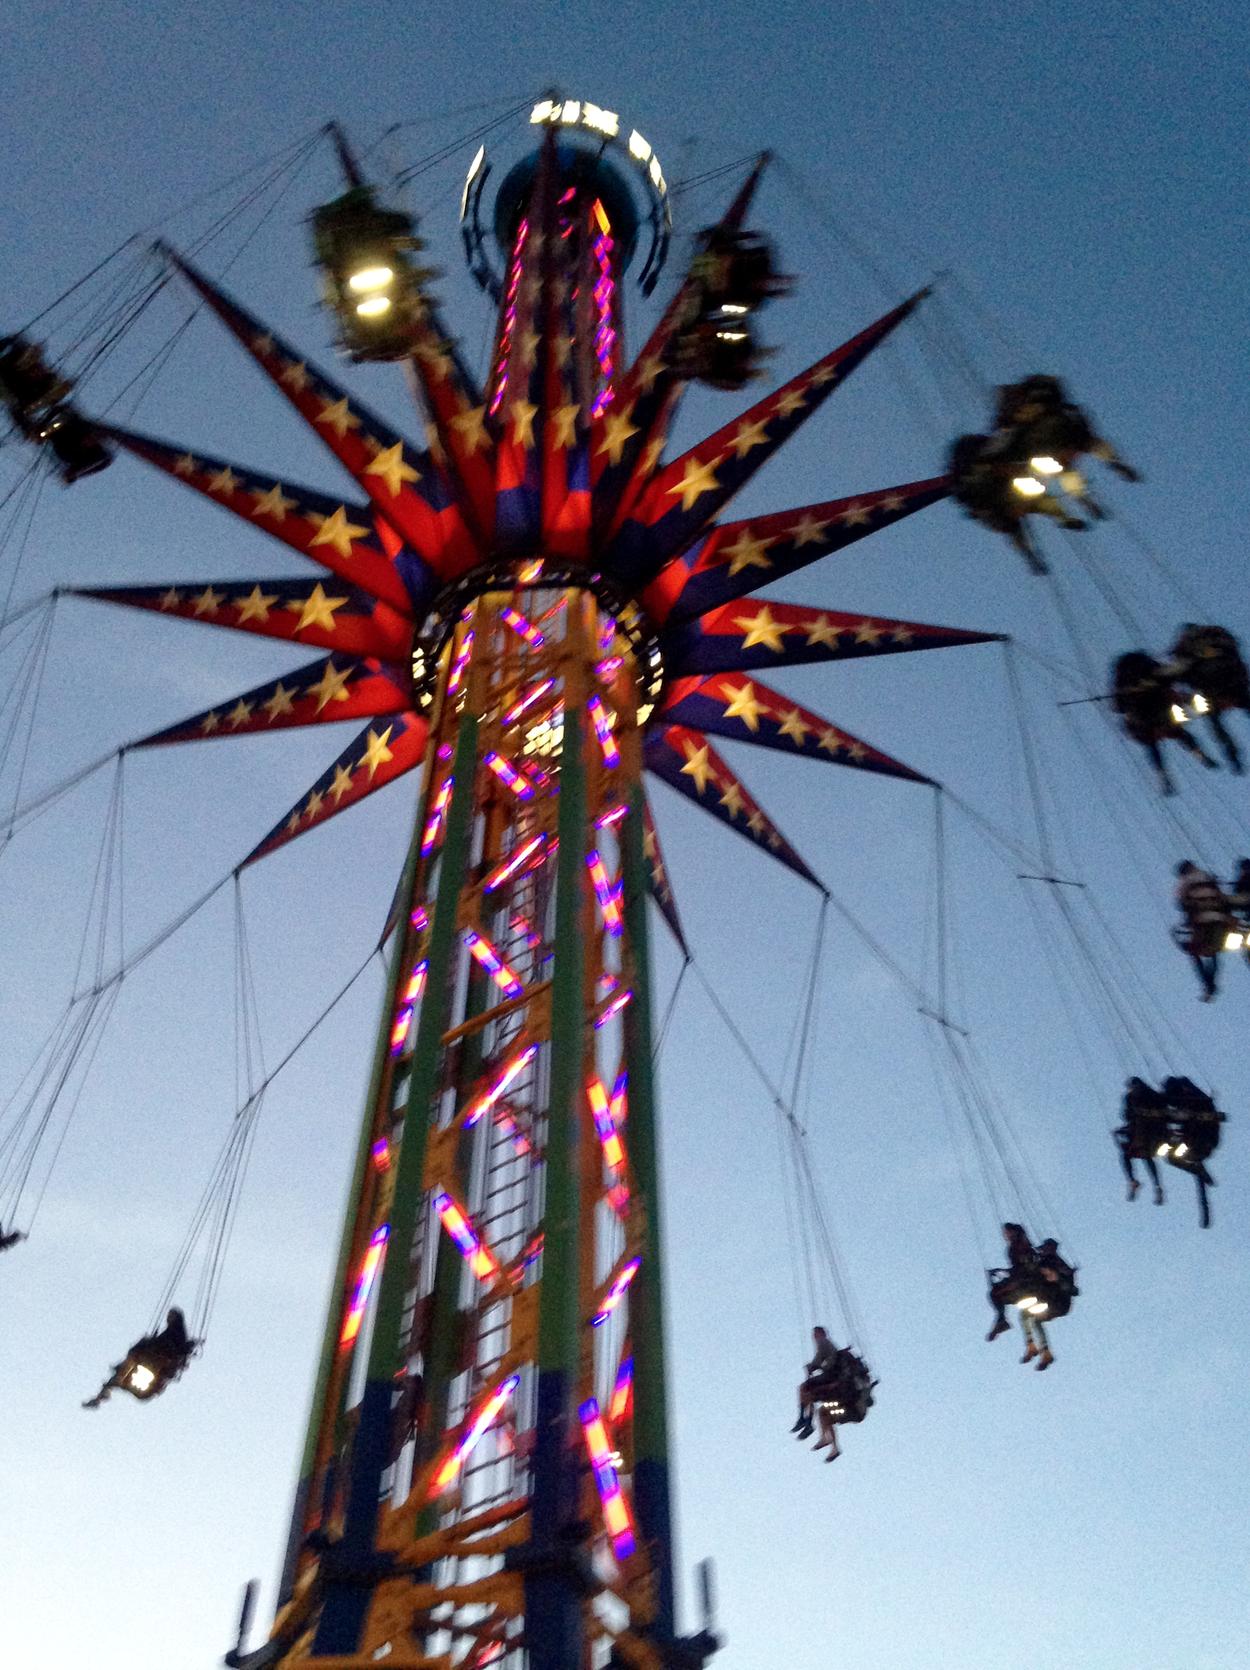 Amusement Park Aesthetic Six Flags Neon Photography Chloehickss Retro Theme Six Flags Summer Aesthetic